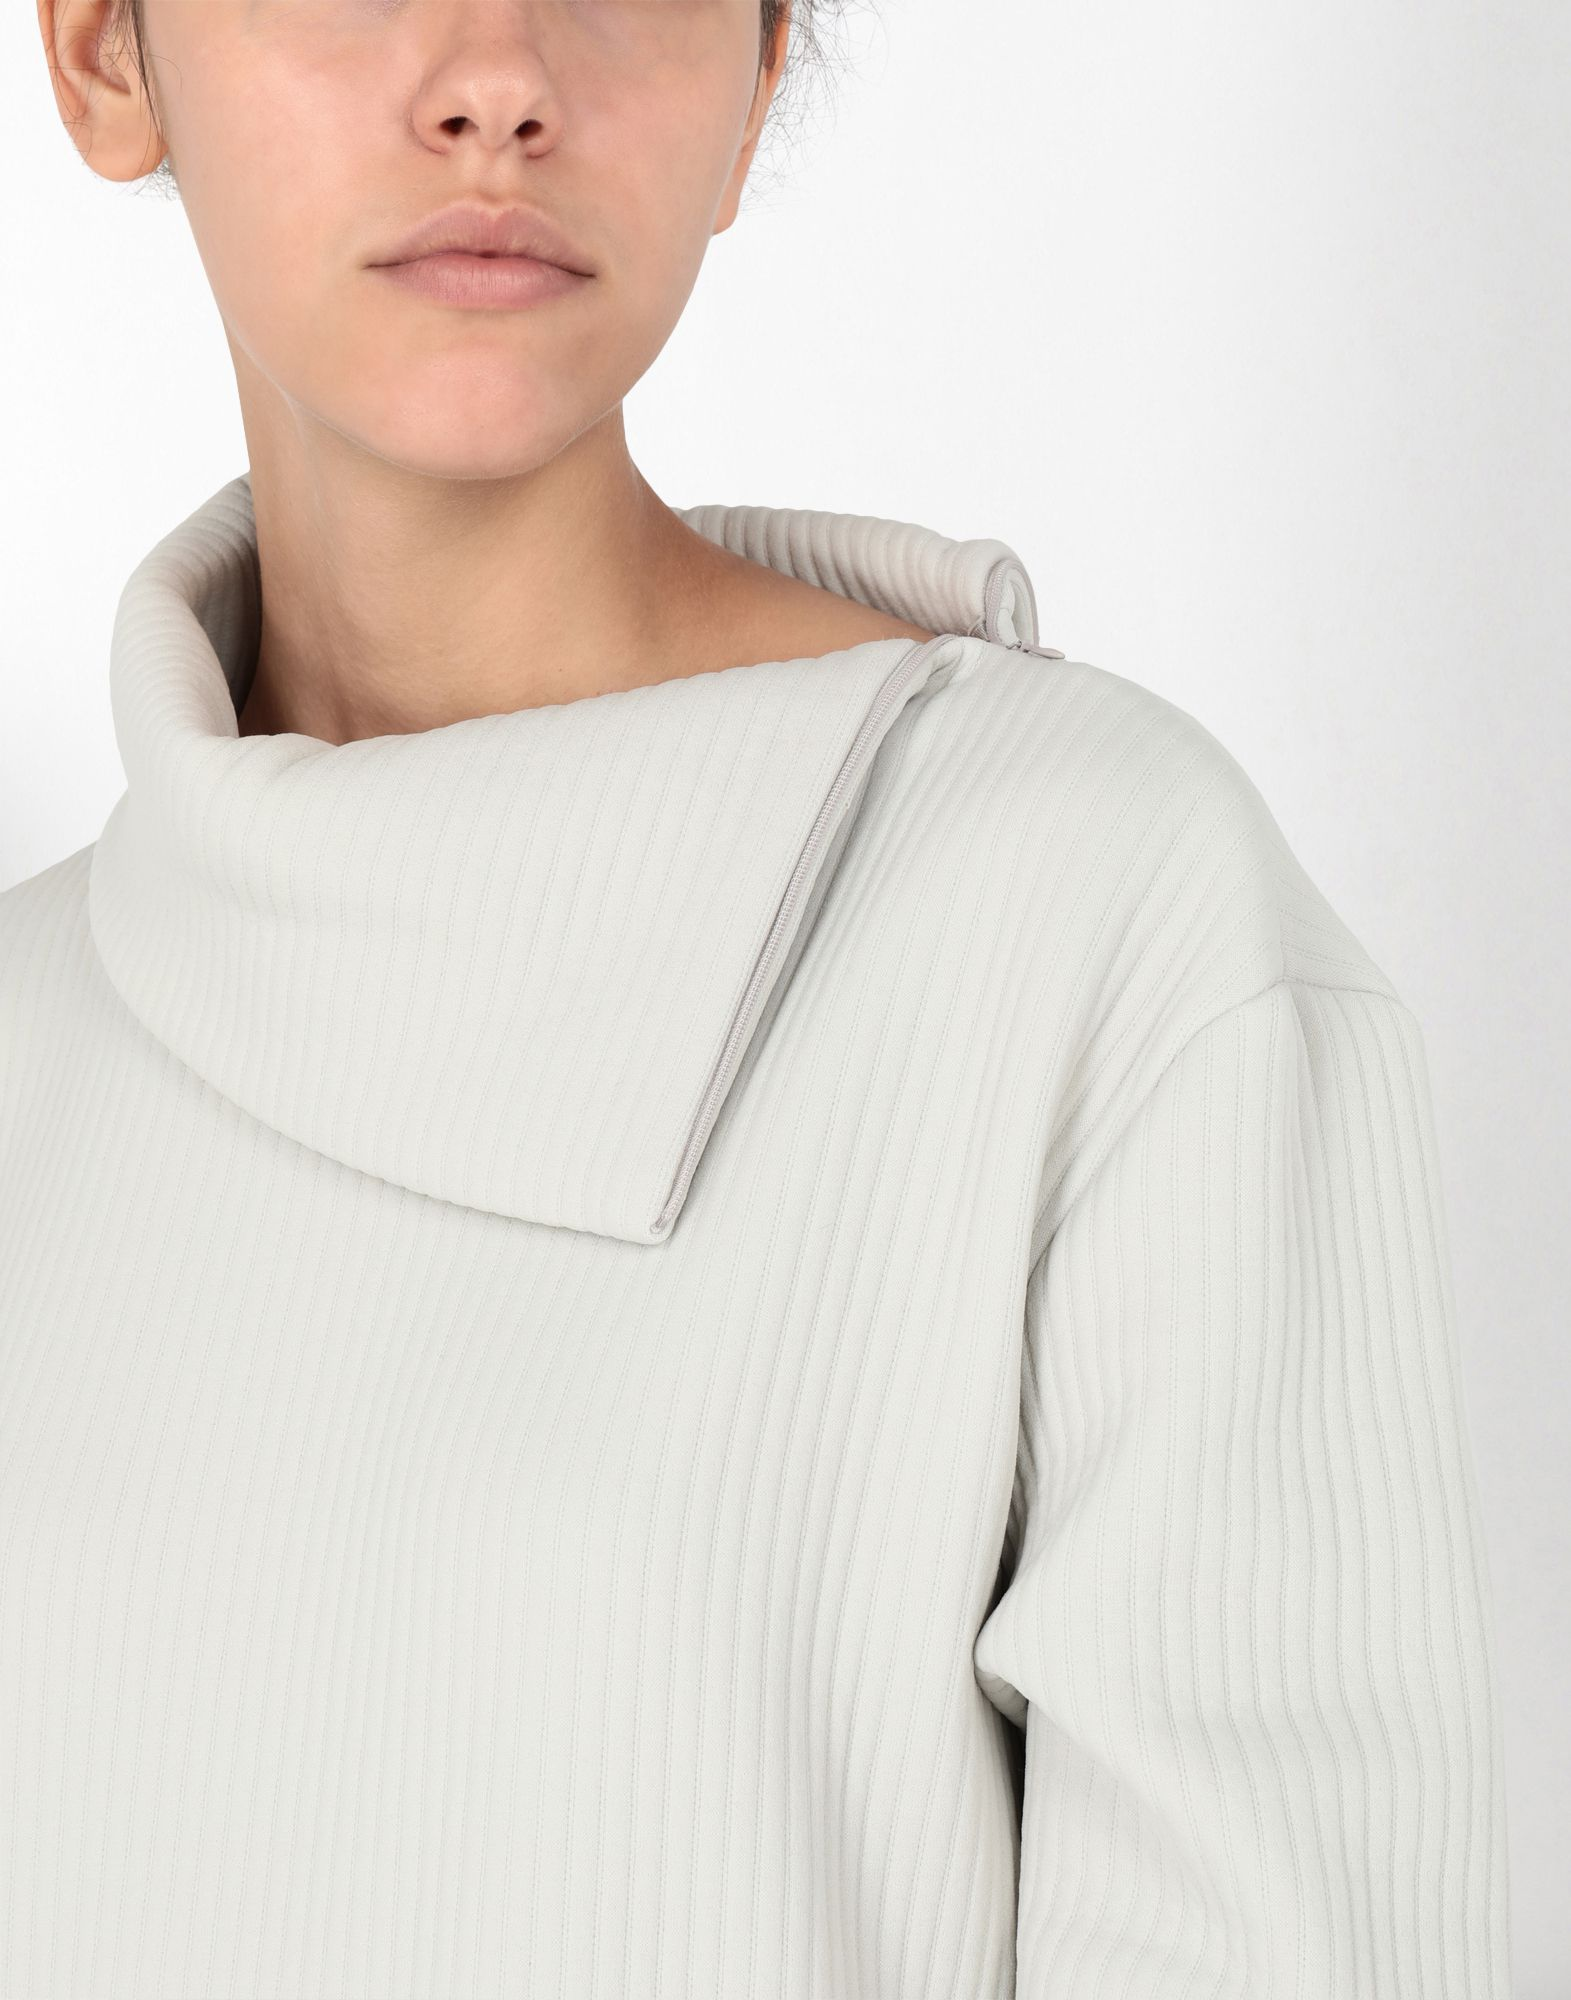 MM6 MAISON MARGIELA Ribbed jersey dress 3/4 length dress Woman e